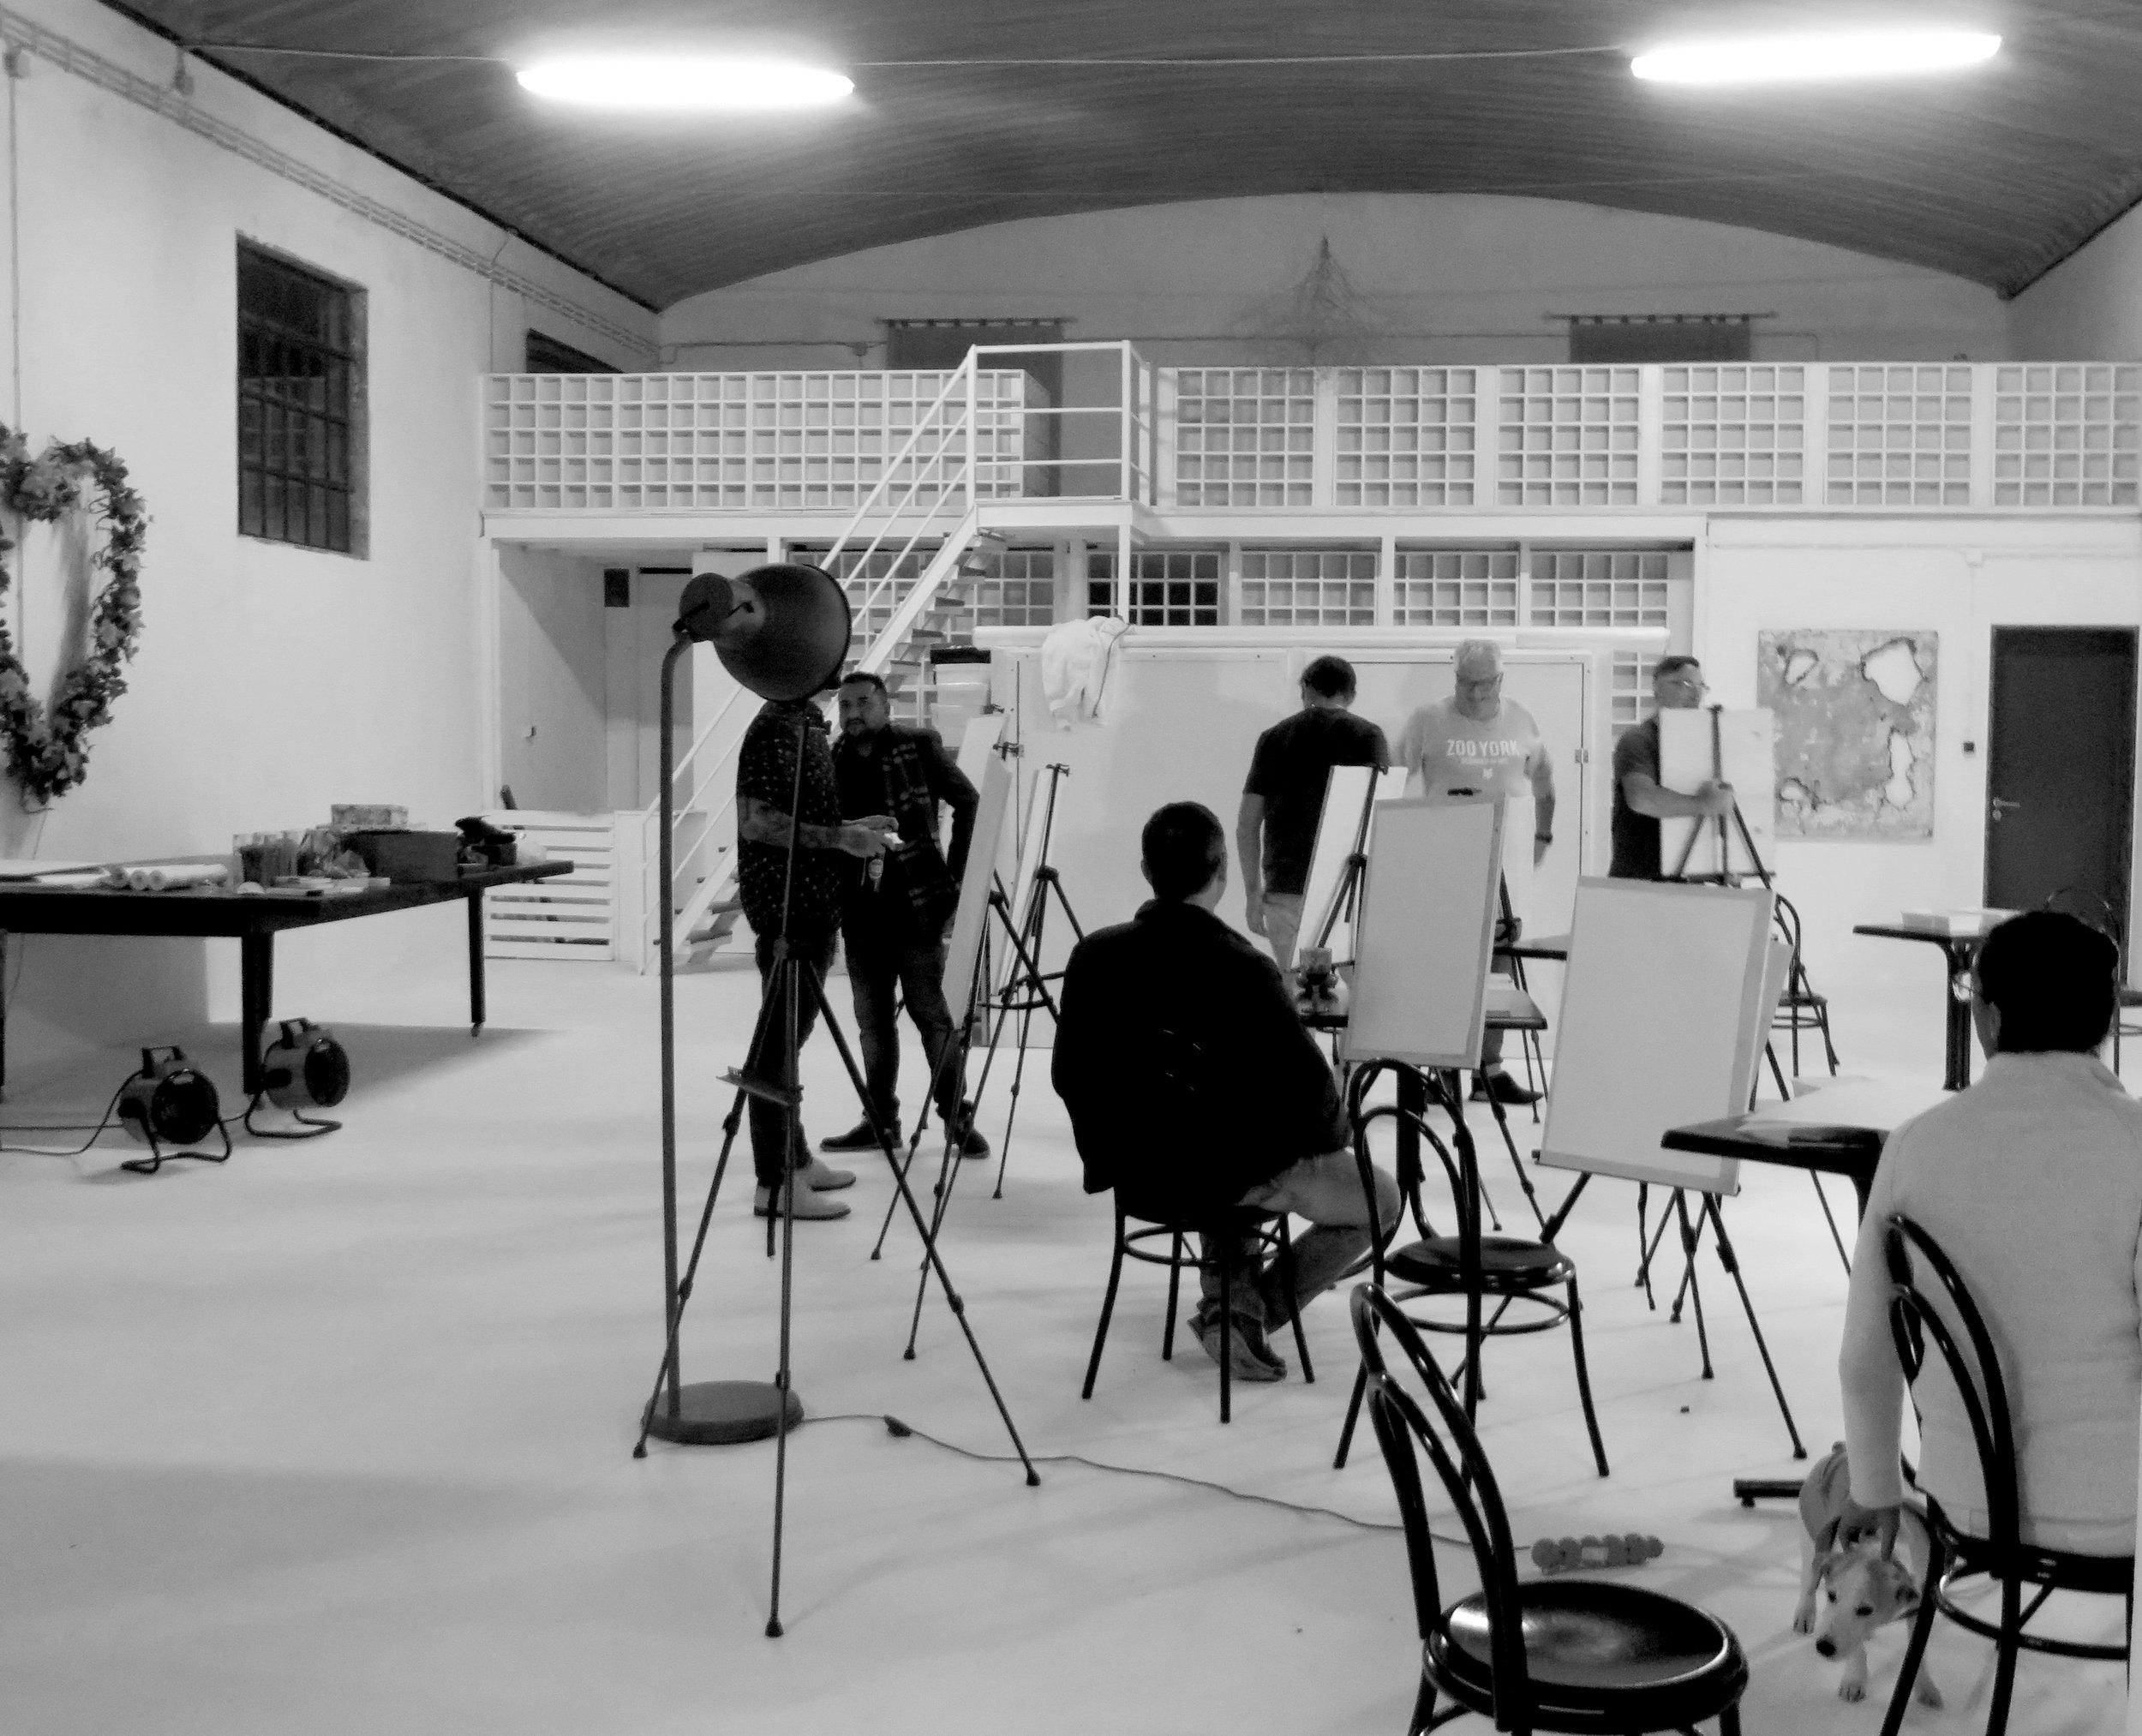 Art-cafe-art-studio-workshop-setup-social.jpg